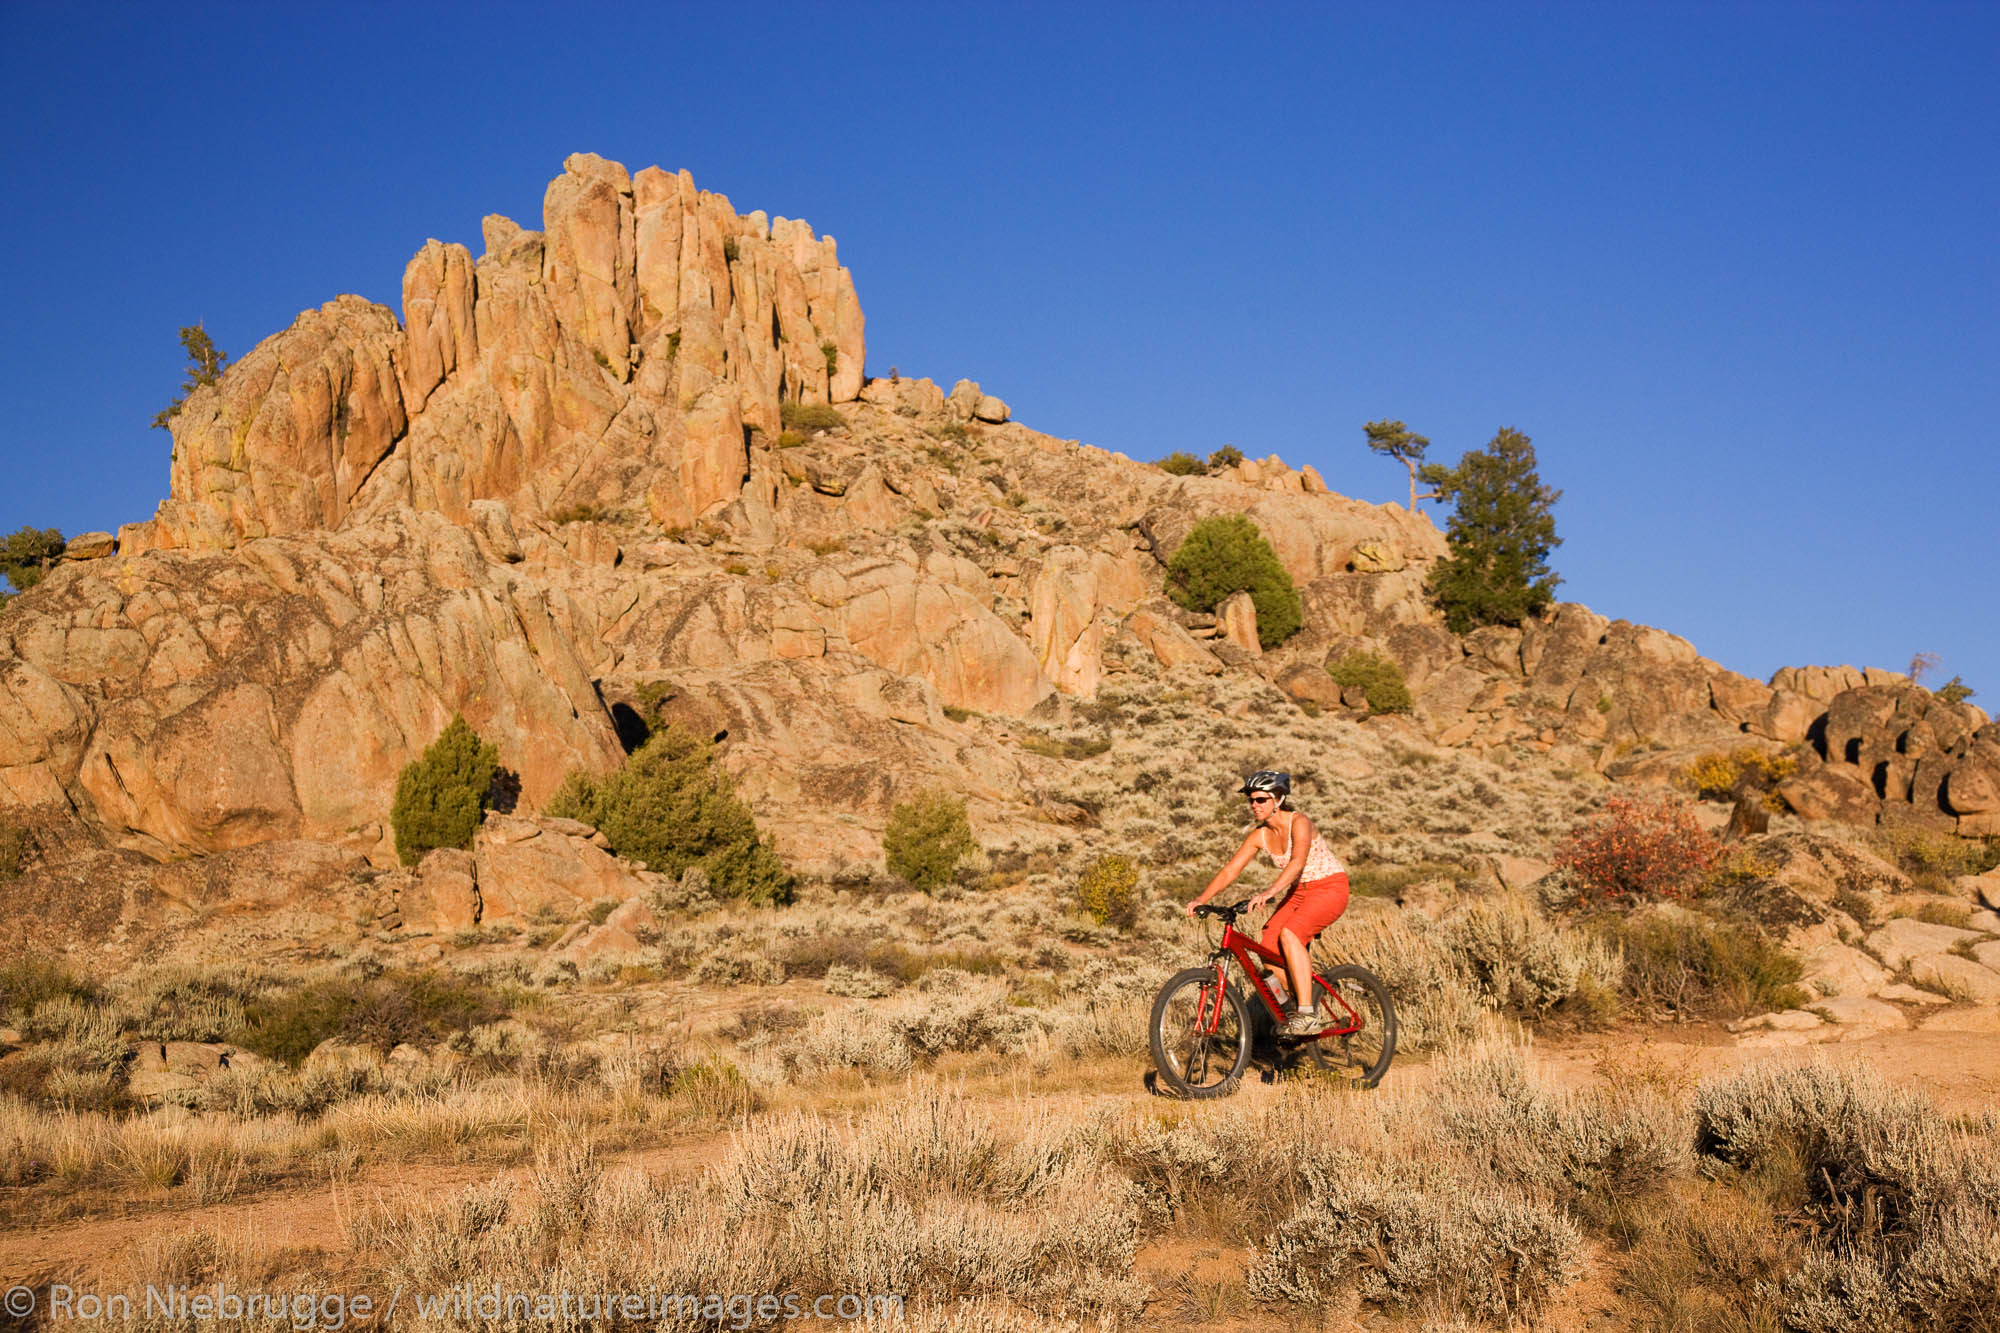 Mountain biking on the Hartman Rocks Recreation Area trails, Gunnison, Colorado.  (model released)